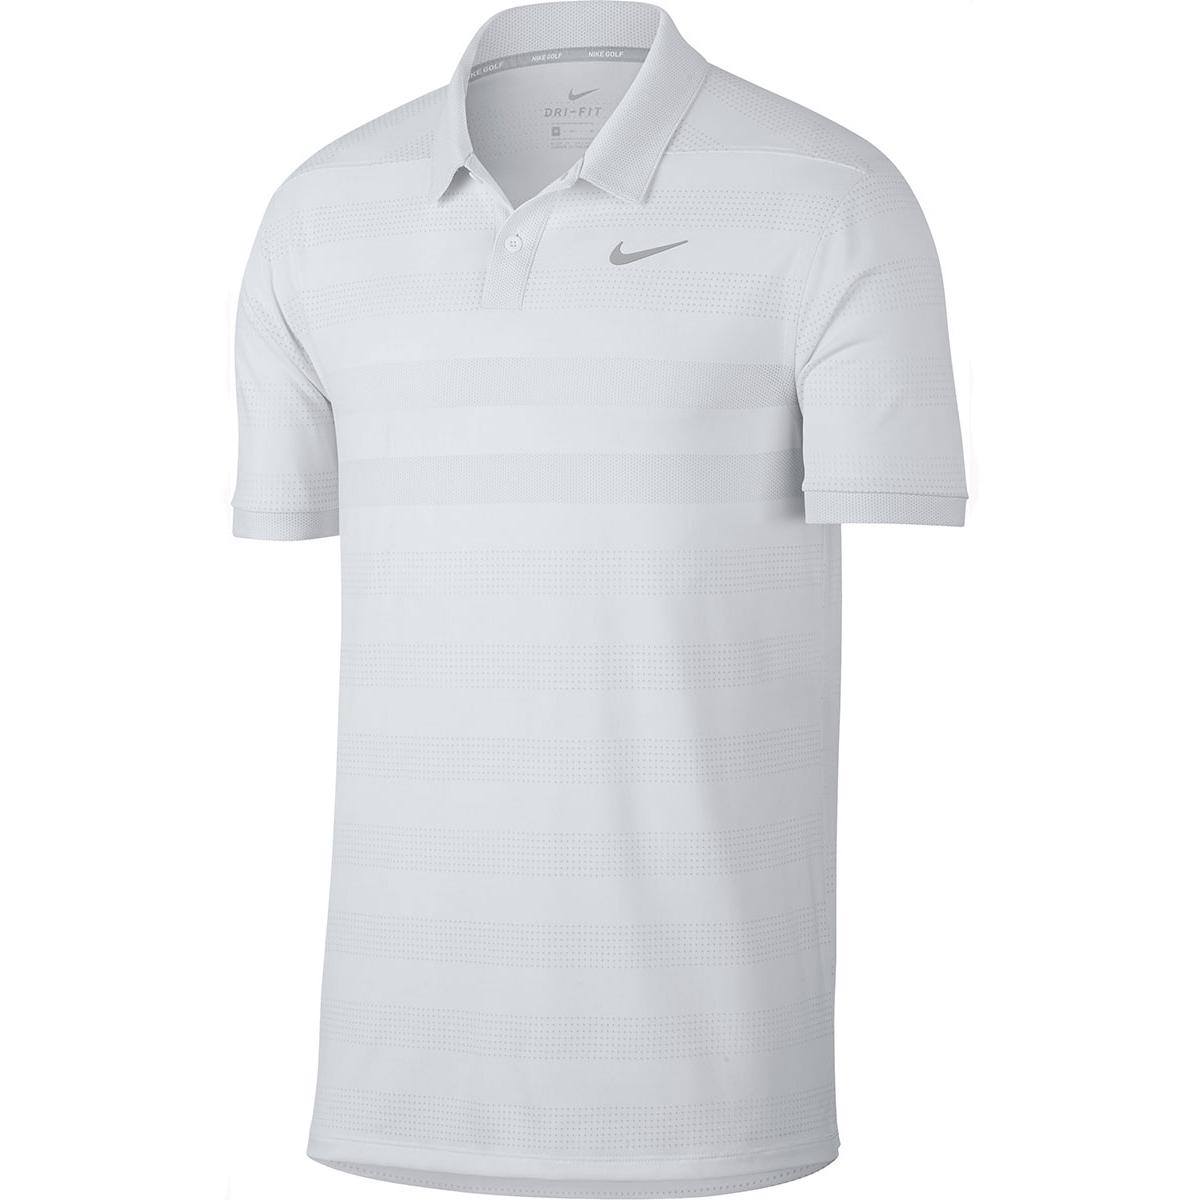 e5d3de75 Nike Golf Zonal Cooling Striped Polo Shirt | Online Golf